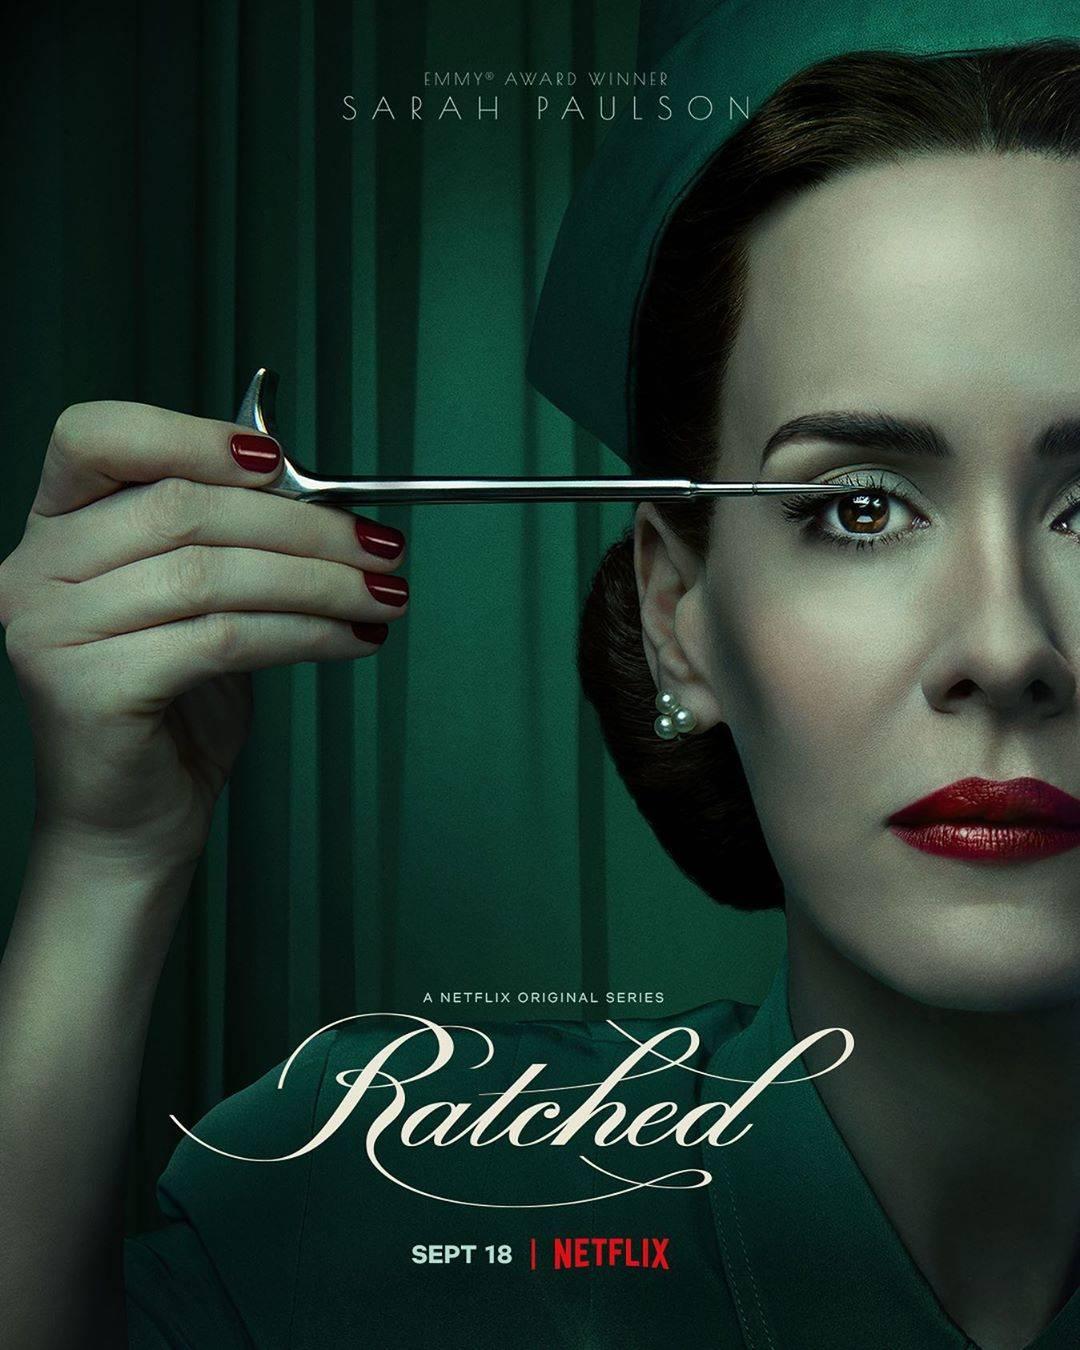 Netflix: Mildred Ratched, ¿Por qué esta serie es esperada en Netflix? |  Series recomendadas - Gente - Cultura - ELTIEMPO.COM  Ratched: Temporada 1